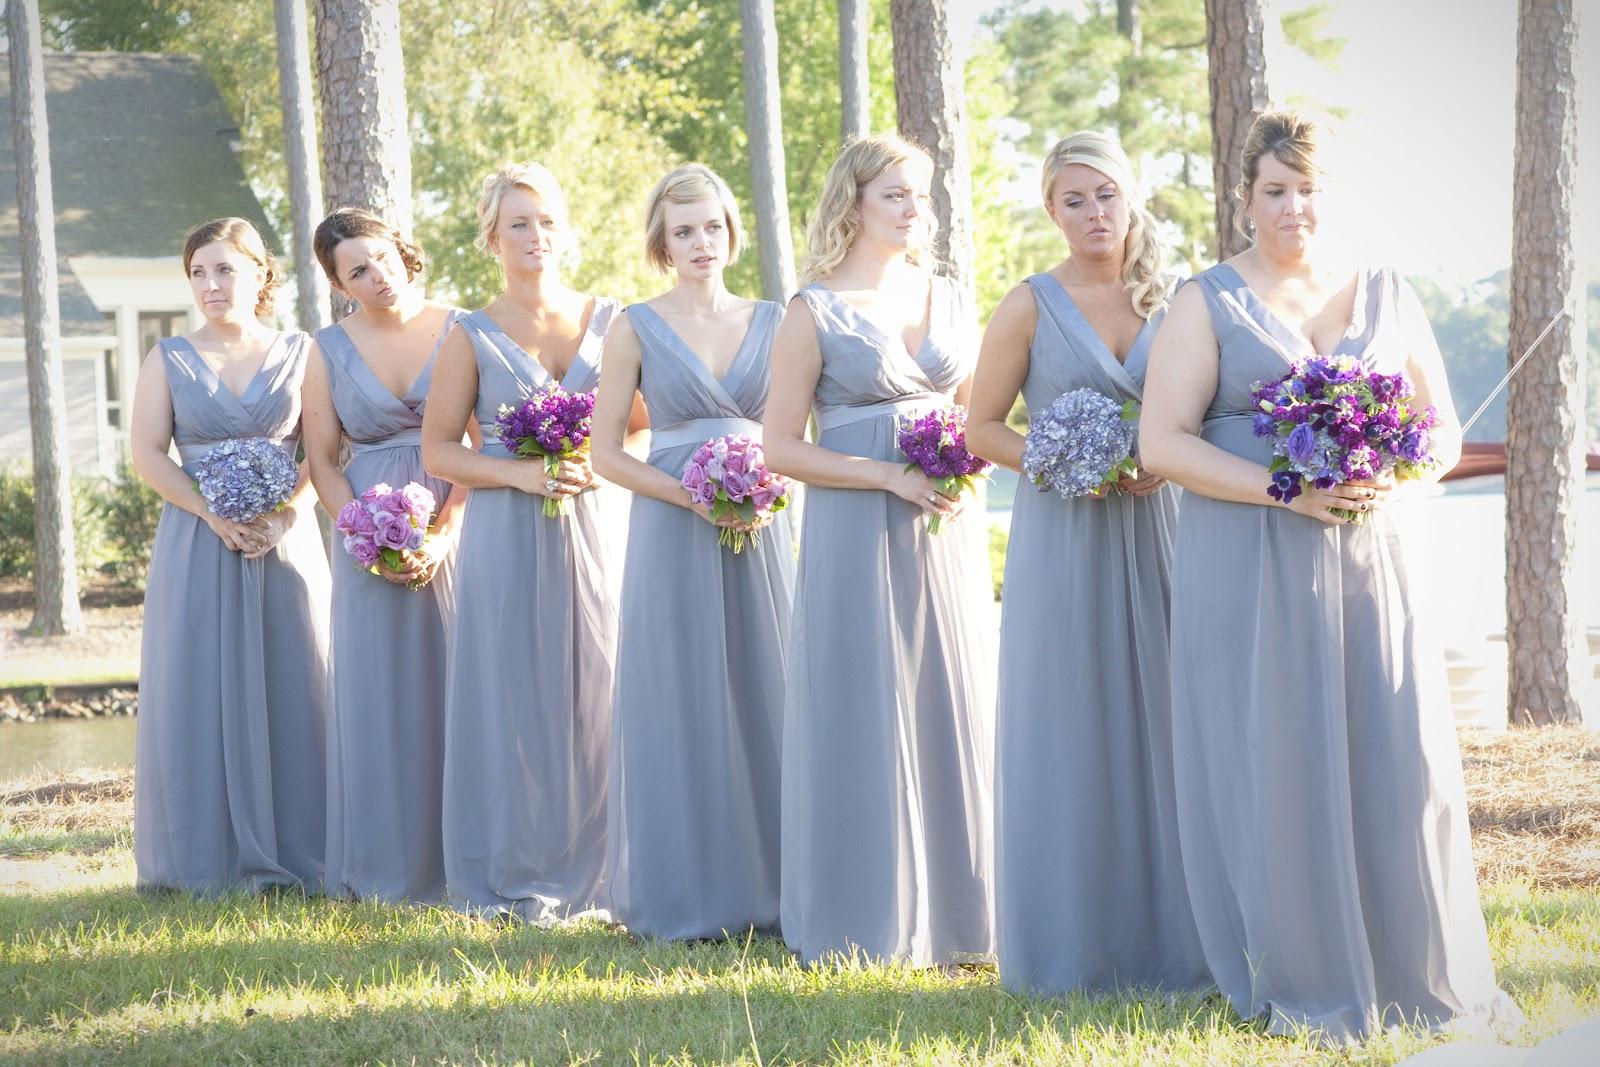 No Regrets Events: No More Nightmare Bridesmaids Dresses!!!!